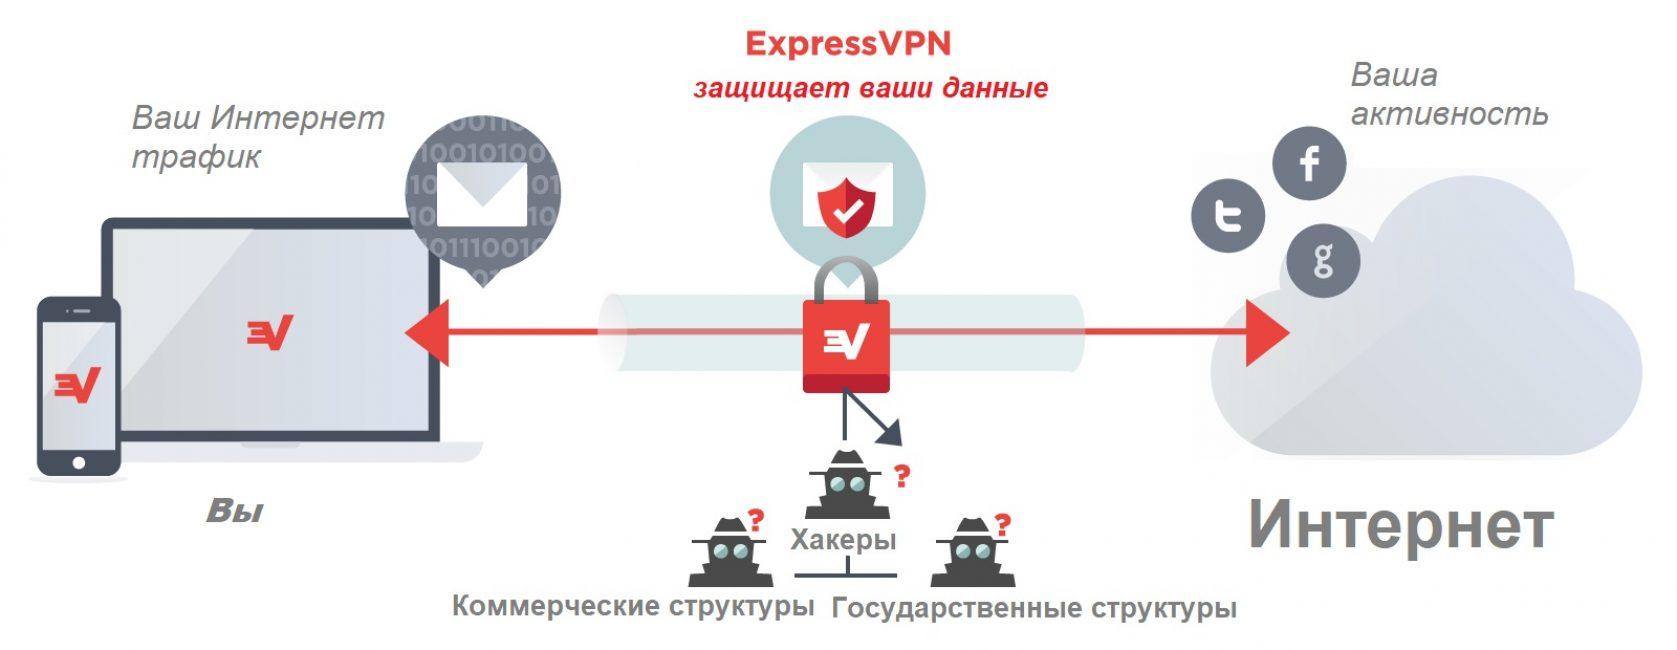 Схема работы VPN сервиса